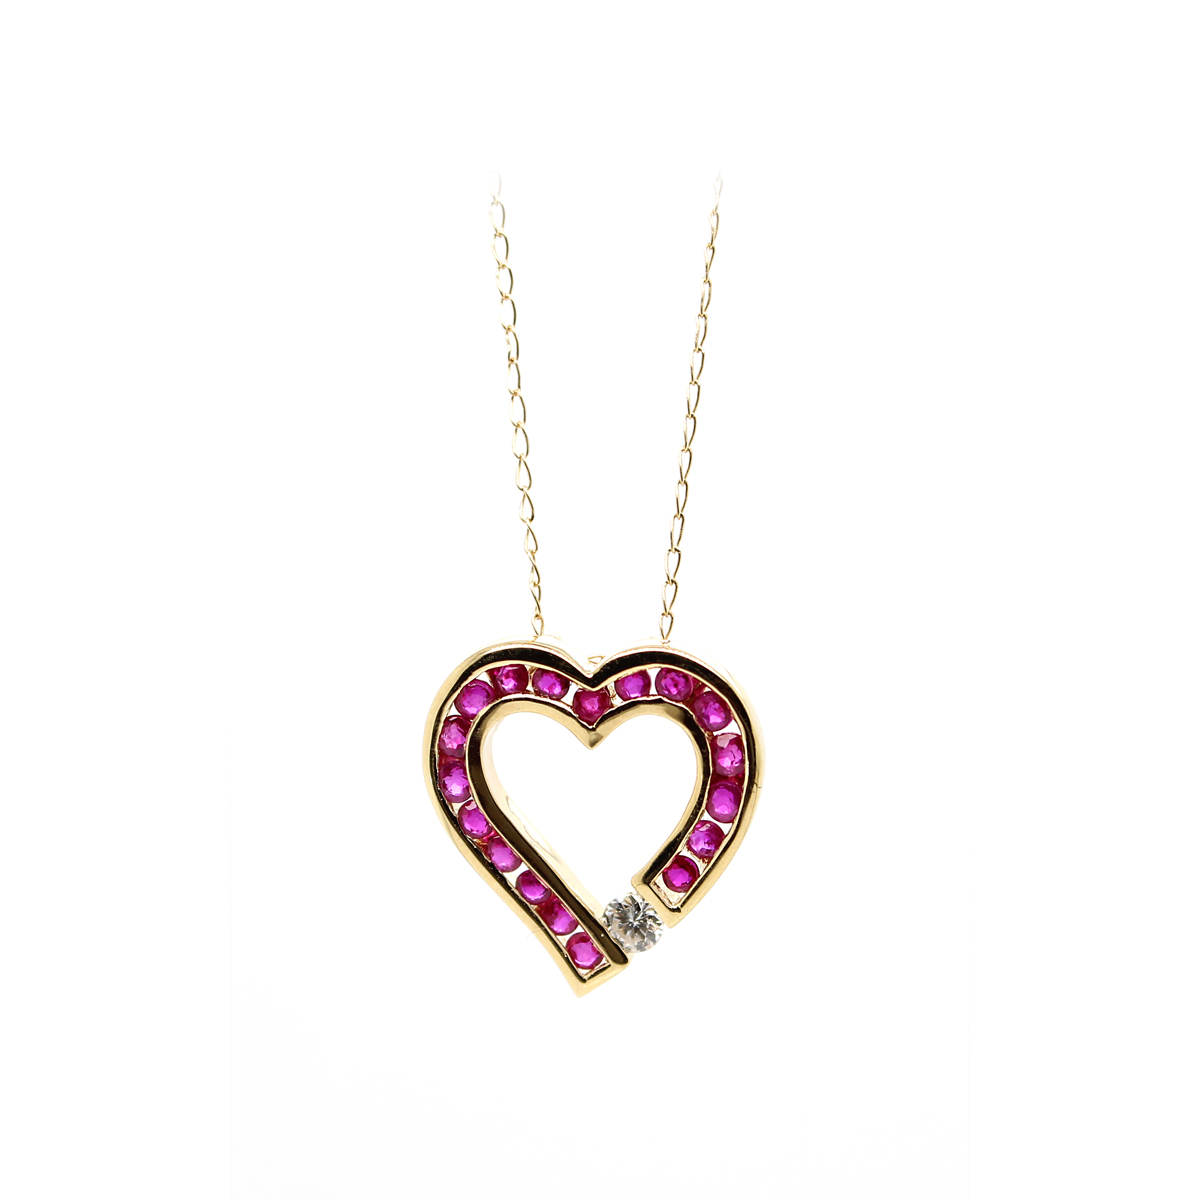 Vintage 14 Karat Yellow Gold Ruby and Diamond Heart Pendant Necklace